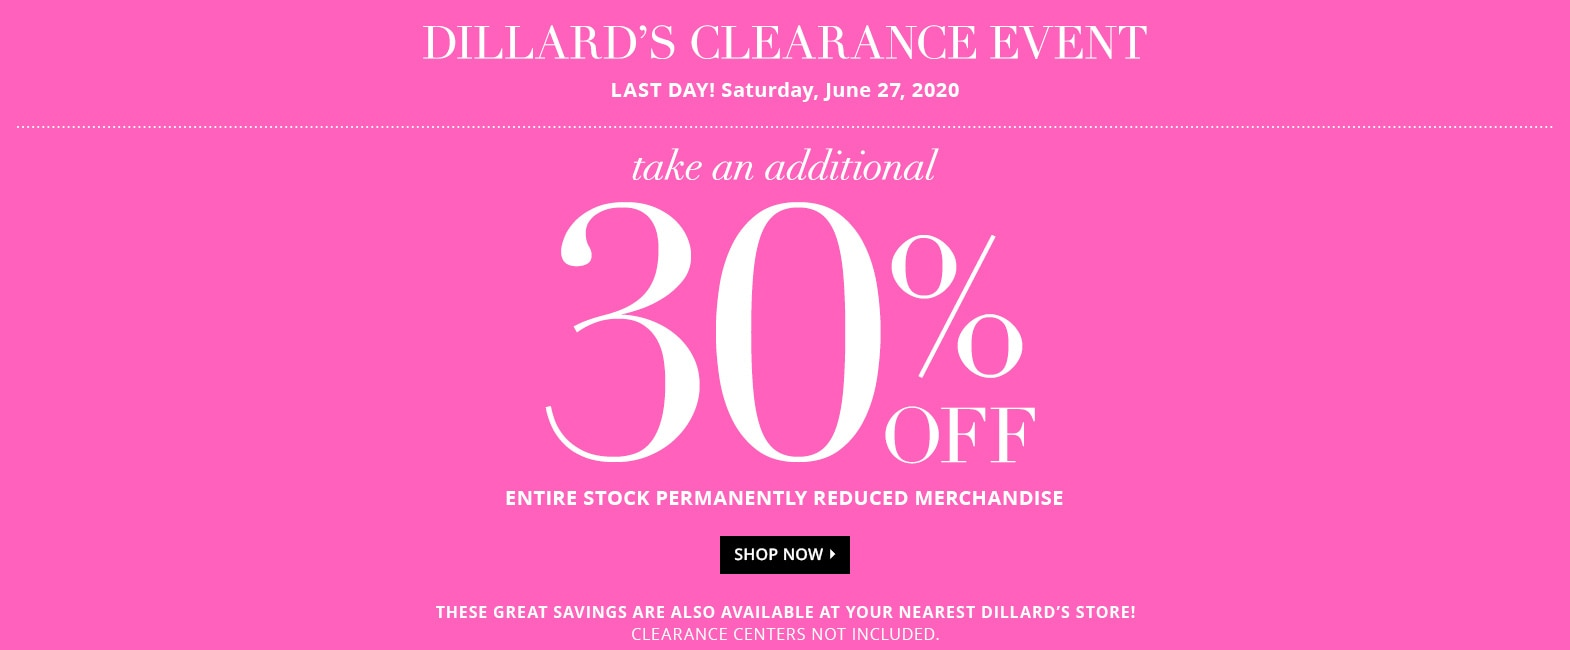 Dillard's Official Site of Dillard's Department Stores